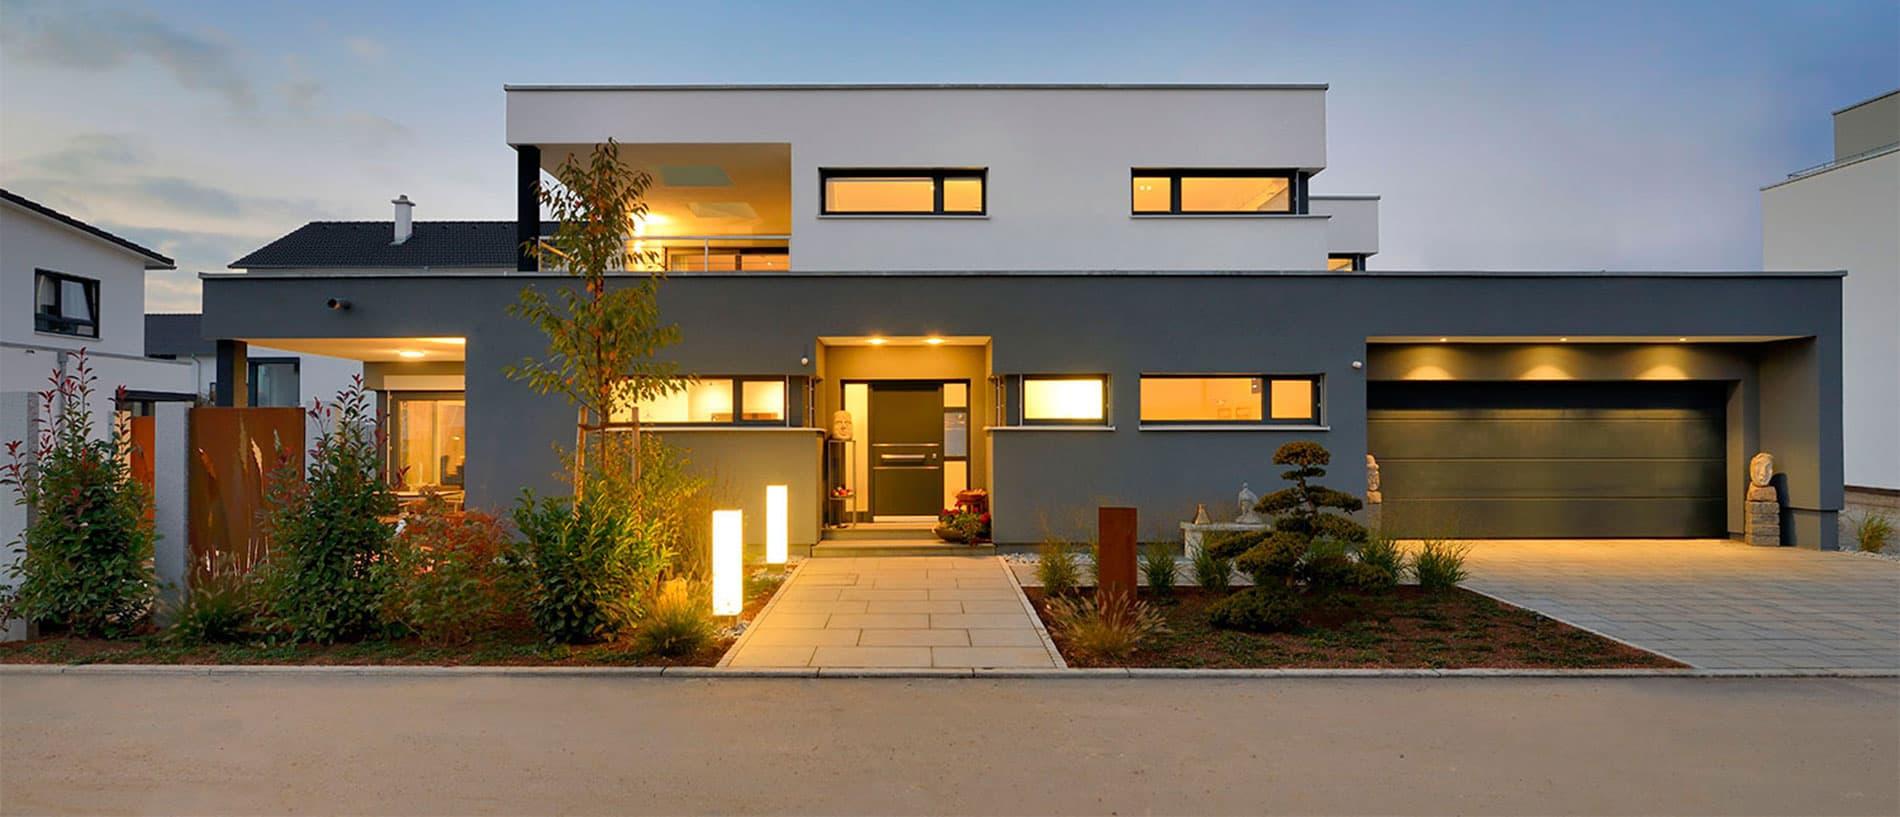 hausbau ideen inspiration f r ihr individuelles zuhause. Black Bedroom Furniture Sets. Home Design Ideas